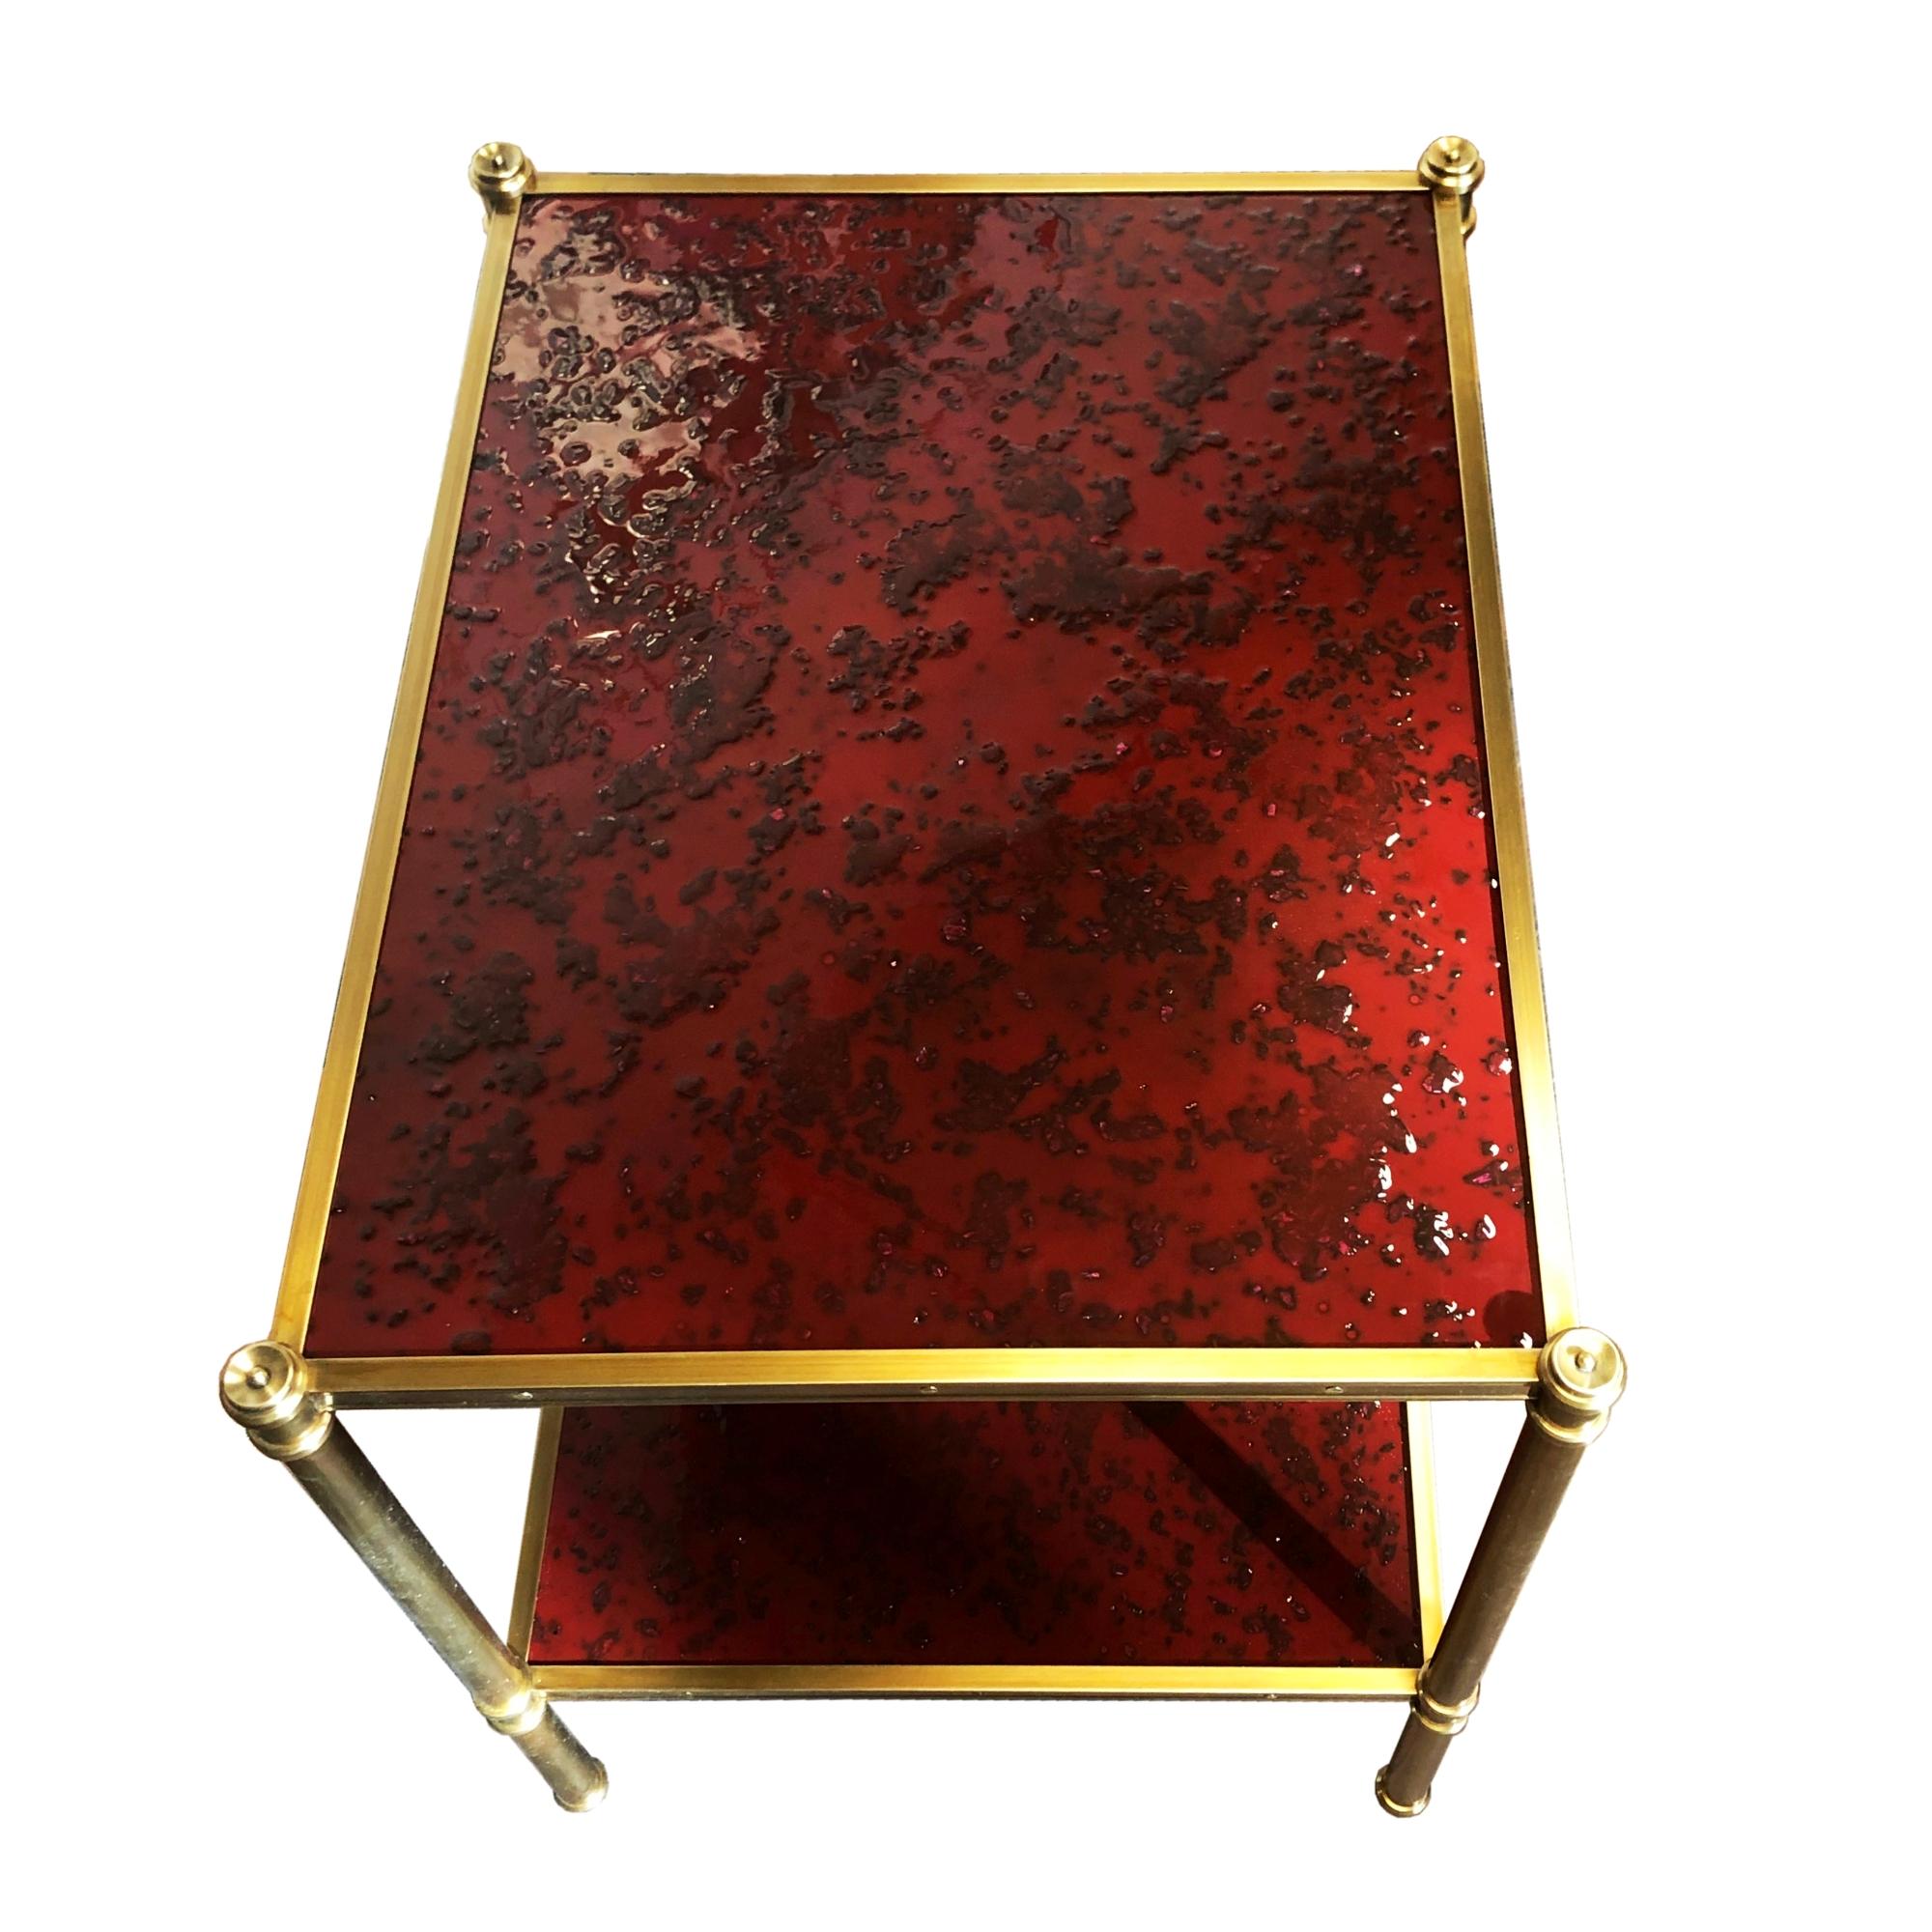 R801ST-Cole-Porter-Side-Table-Custom-Size-Finish-Materials-Bespoke-Victoria-Son-Red-Molten-Gypsum-Brass.jpg